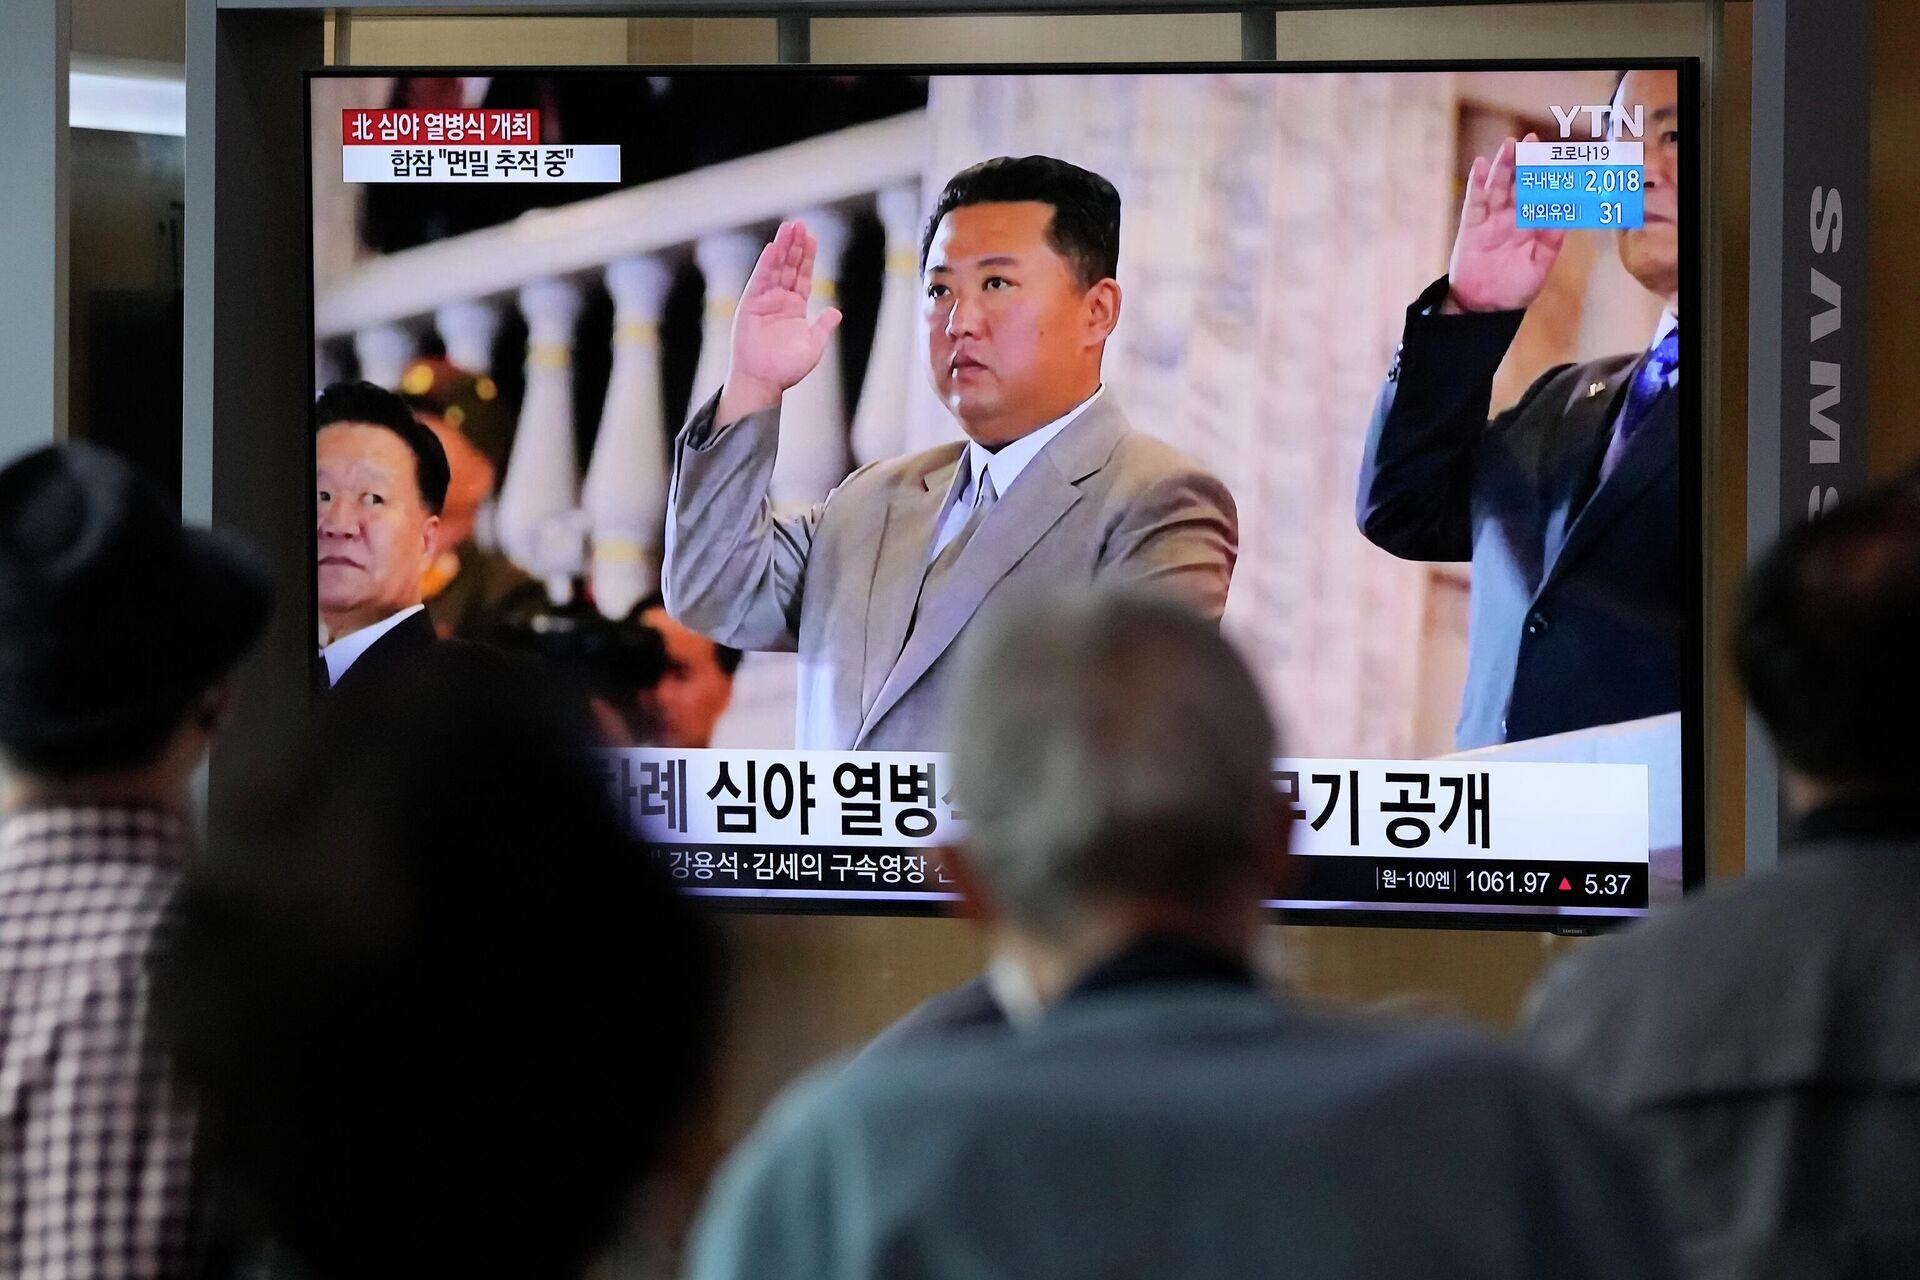 H Βόρεια Κορέα προχώρησε σε δοκιμαστικές εκτοξεύσεις πυραύλων κρουζ μεγάλου βεληνεκούς. Τις παρακολουθεί  ο Κιμ Γιονγκ Ουν από την τηλεόραση.  - Sputnik Ελλάδα, 1920, 13.09.2021